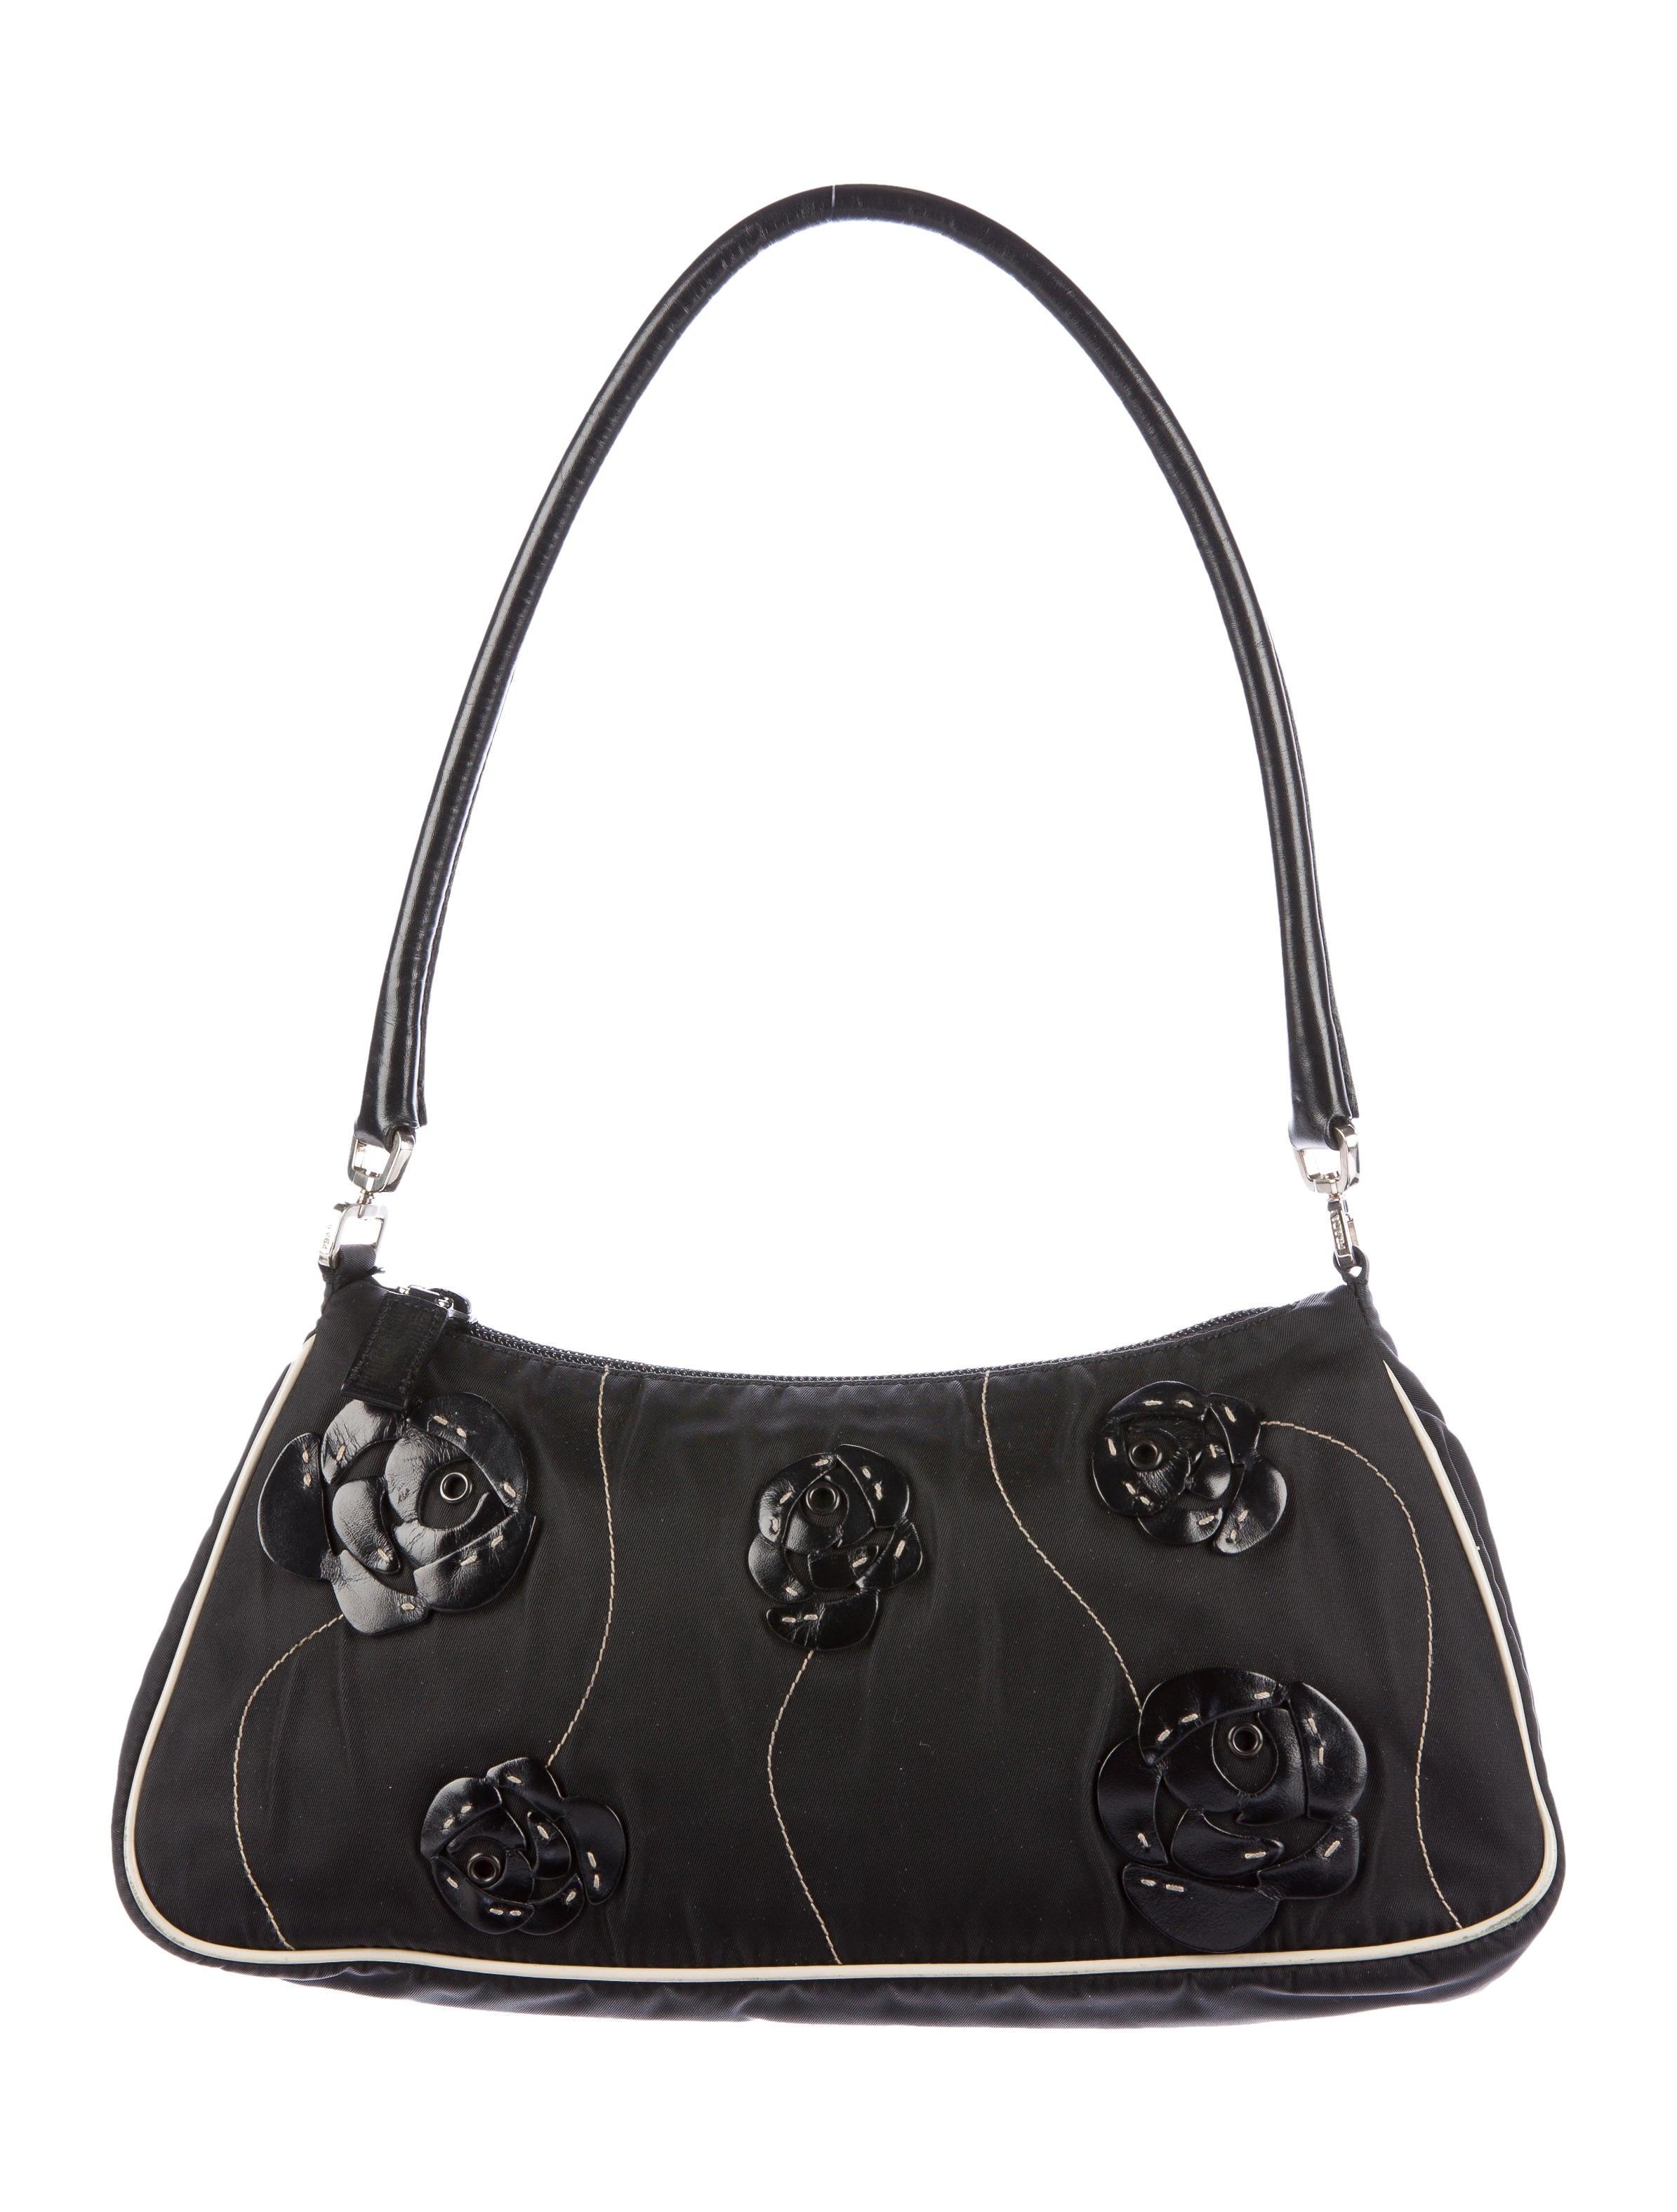 bbadd85ac5ac Prada Floral Tessuto Shoulder Bag - Handbags - PRA134014 | The RealReal